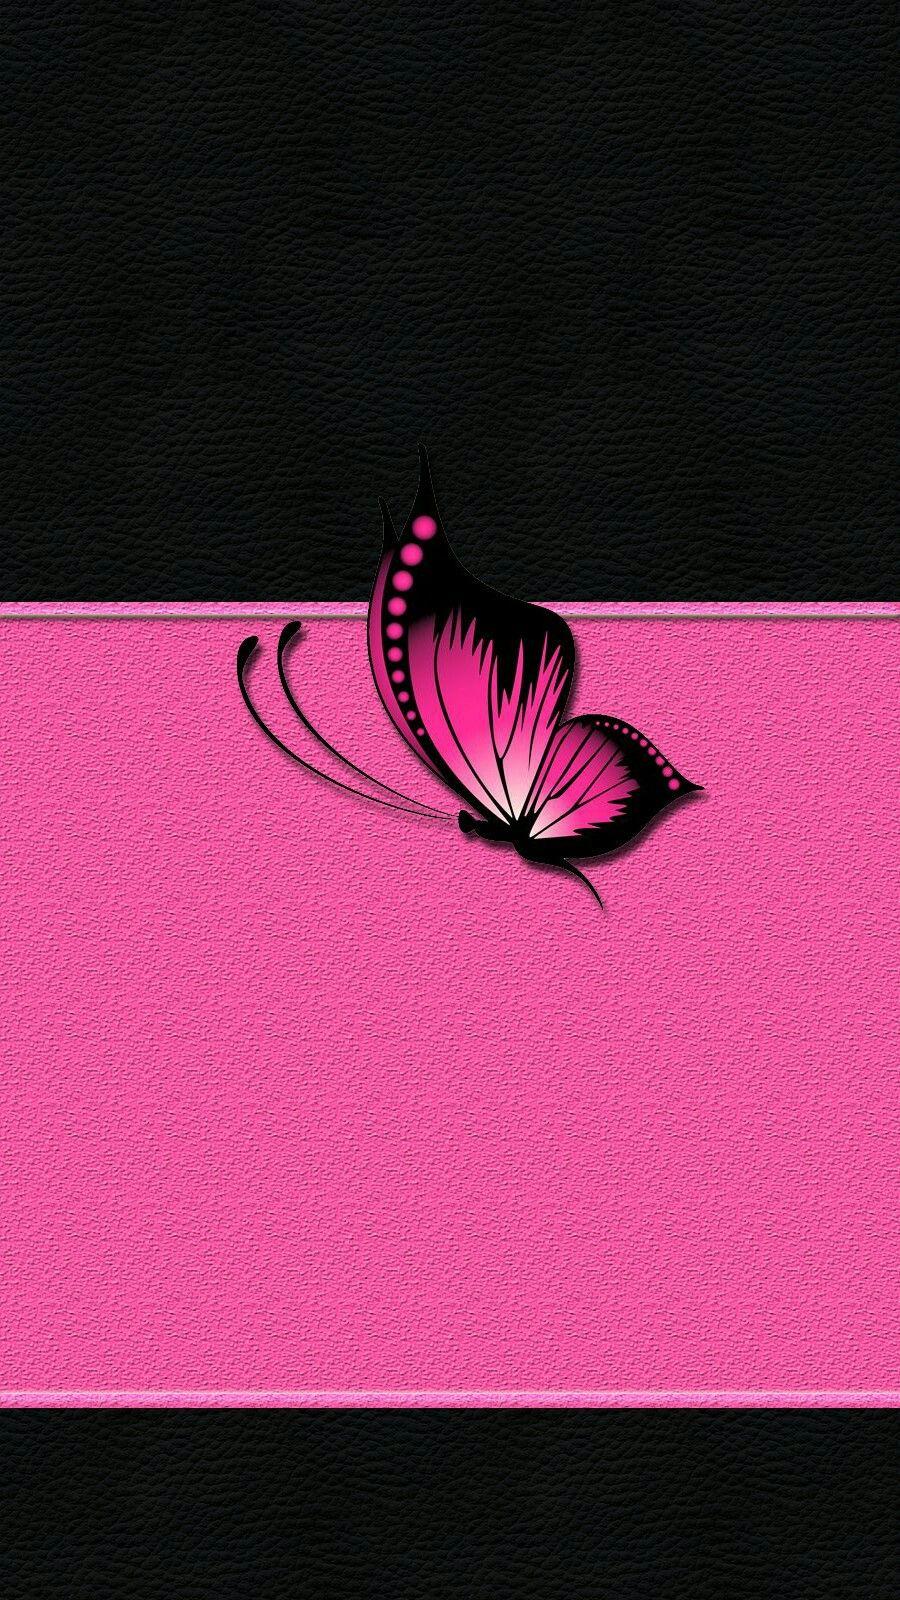 Black Pink Roses Wallpaper By Artist Unknown Rose Wallpaper Cellphone Wallpaper Backgrounds Flowery Wallpaper